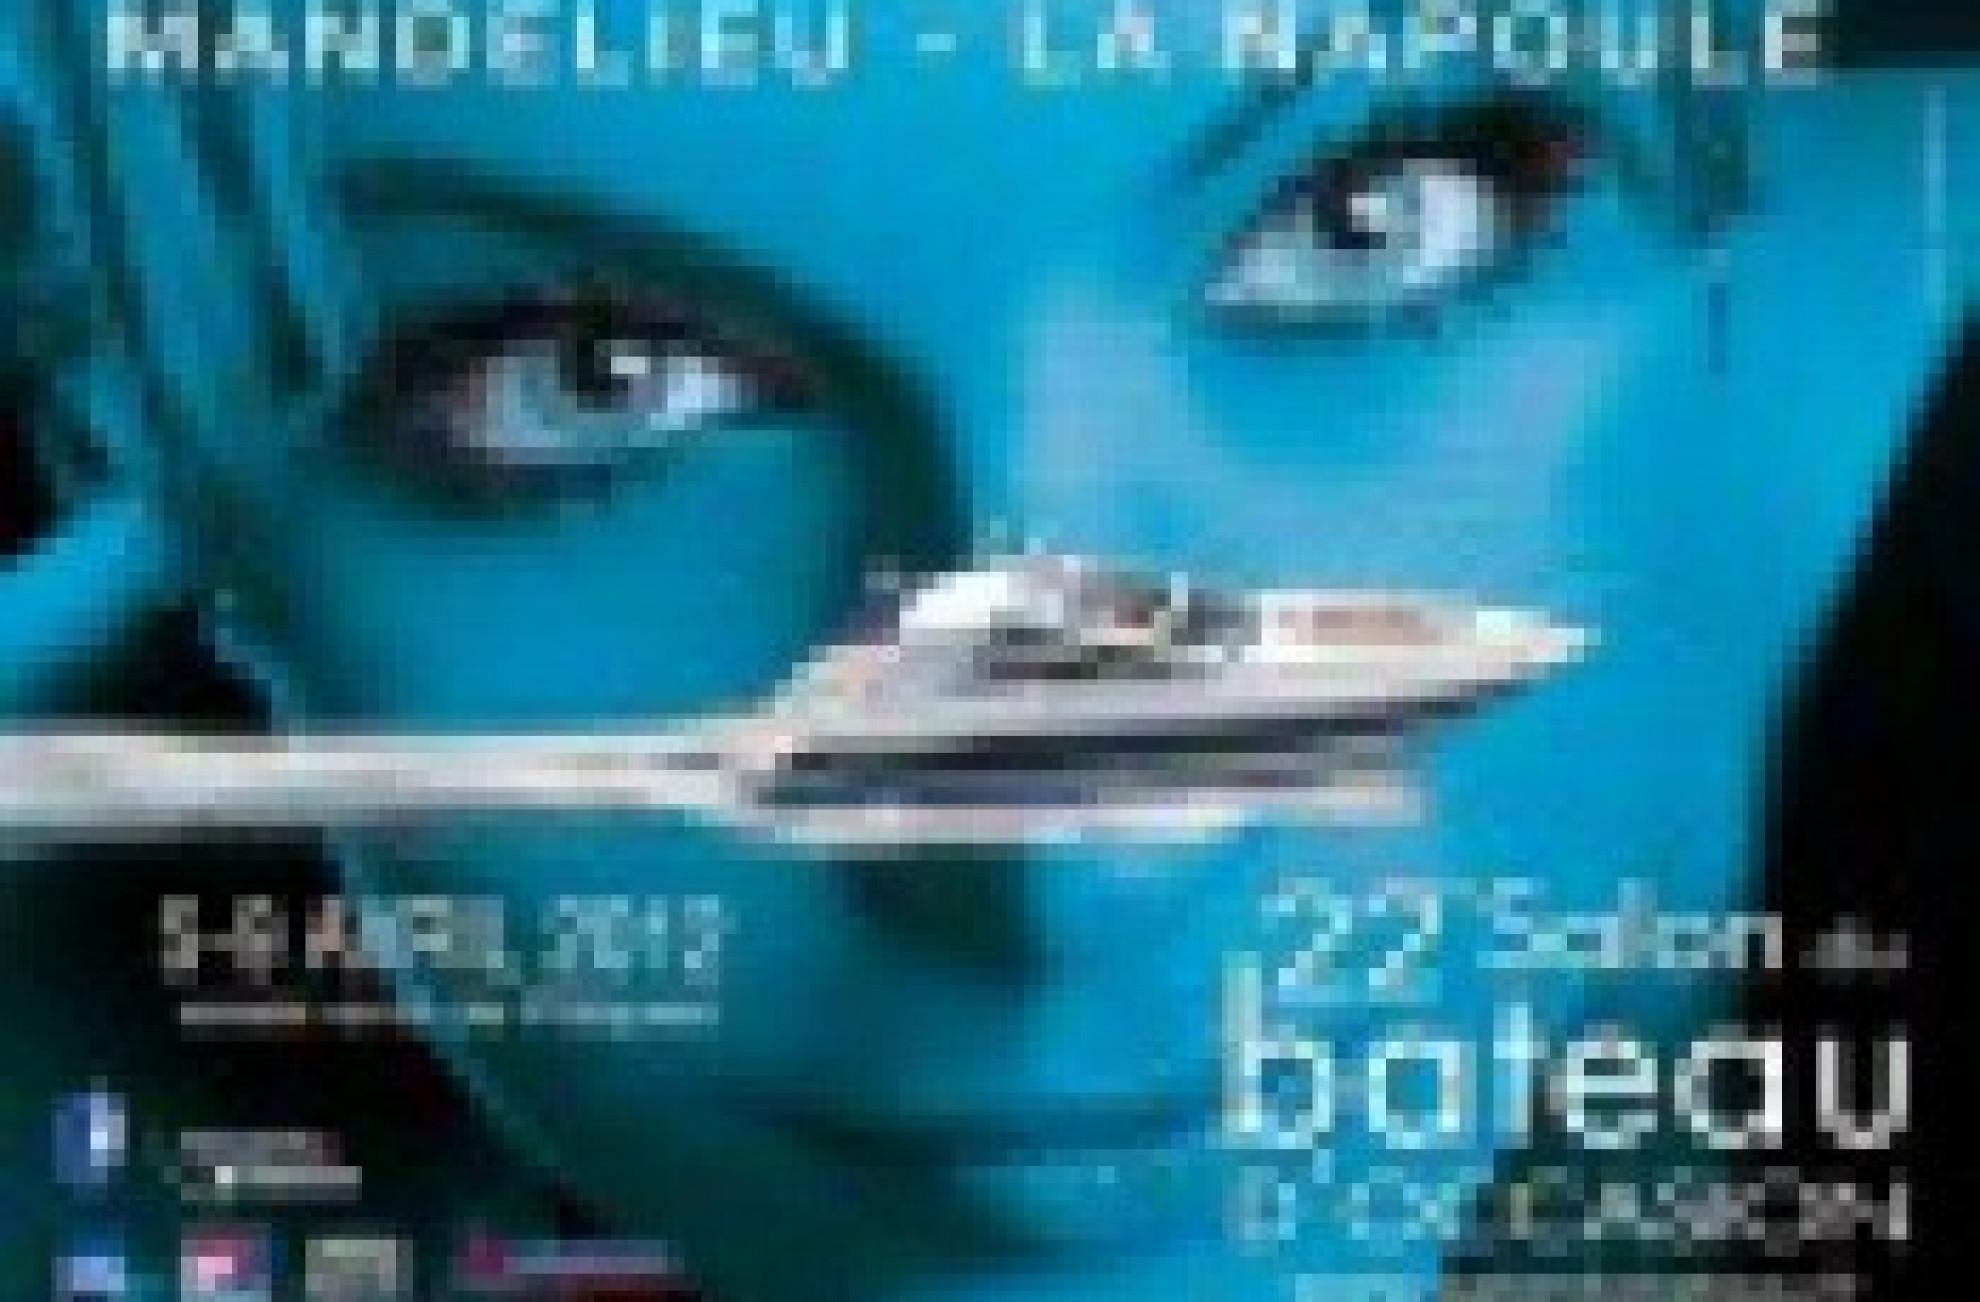 Salon du bateau d'occasion de Mandelieu 4-9 avril